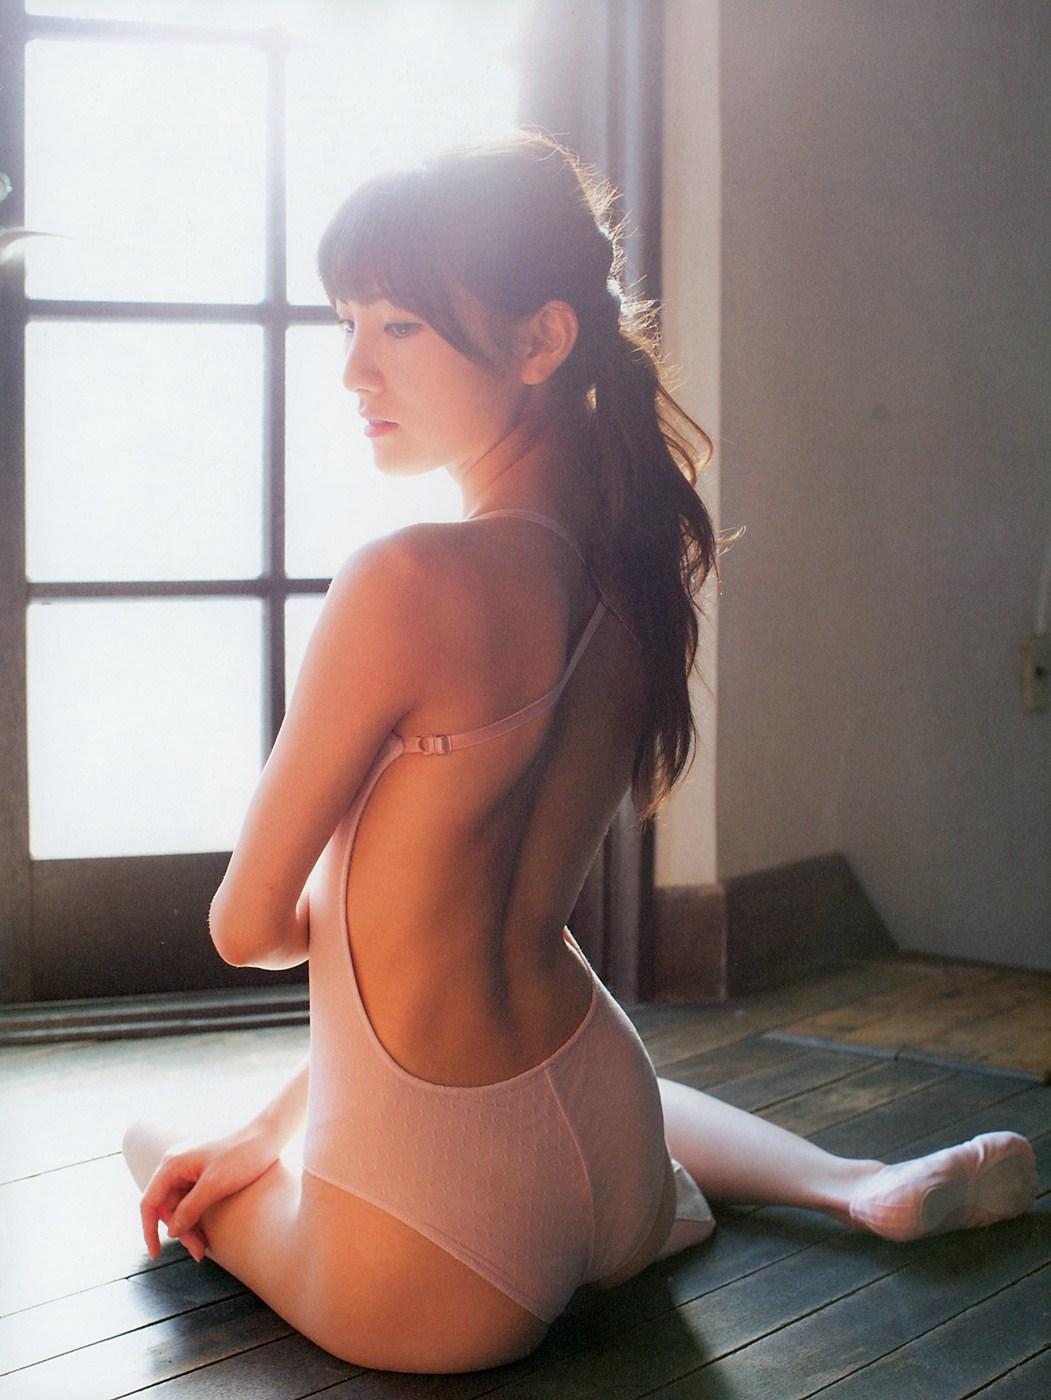 Okada Nana 岡田奈々 AKB48, B.L.T Graph Vol.03 2016 Gravure